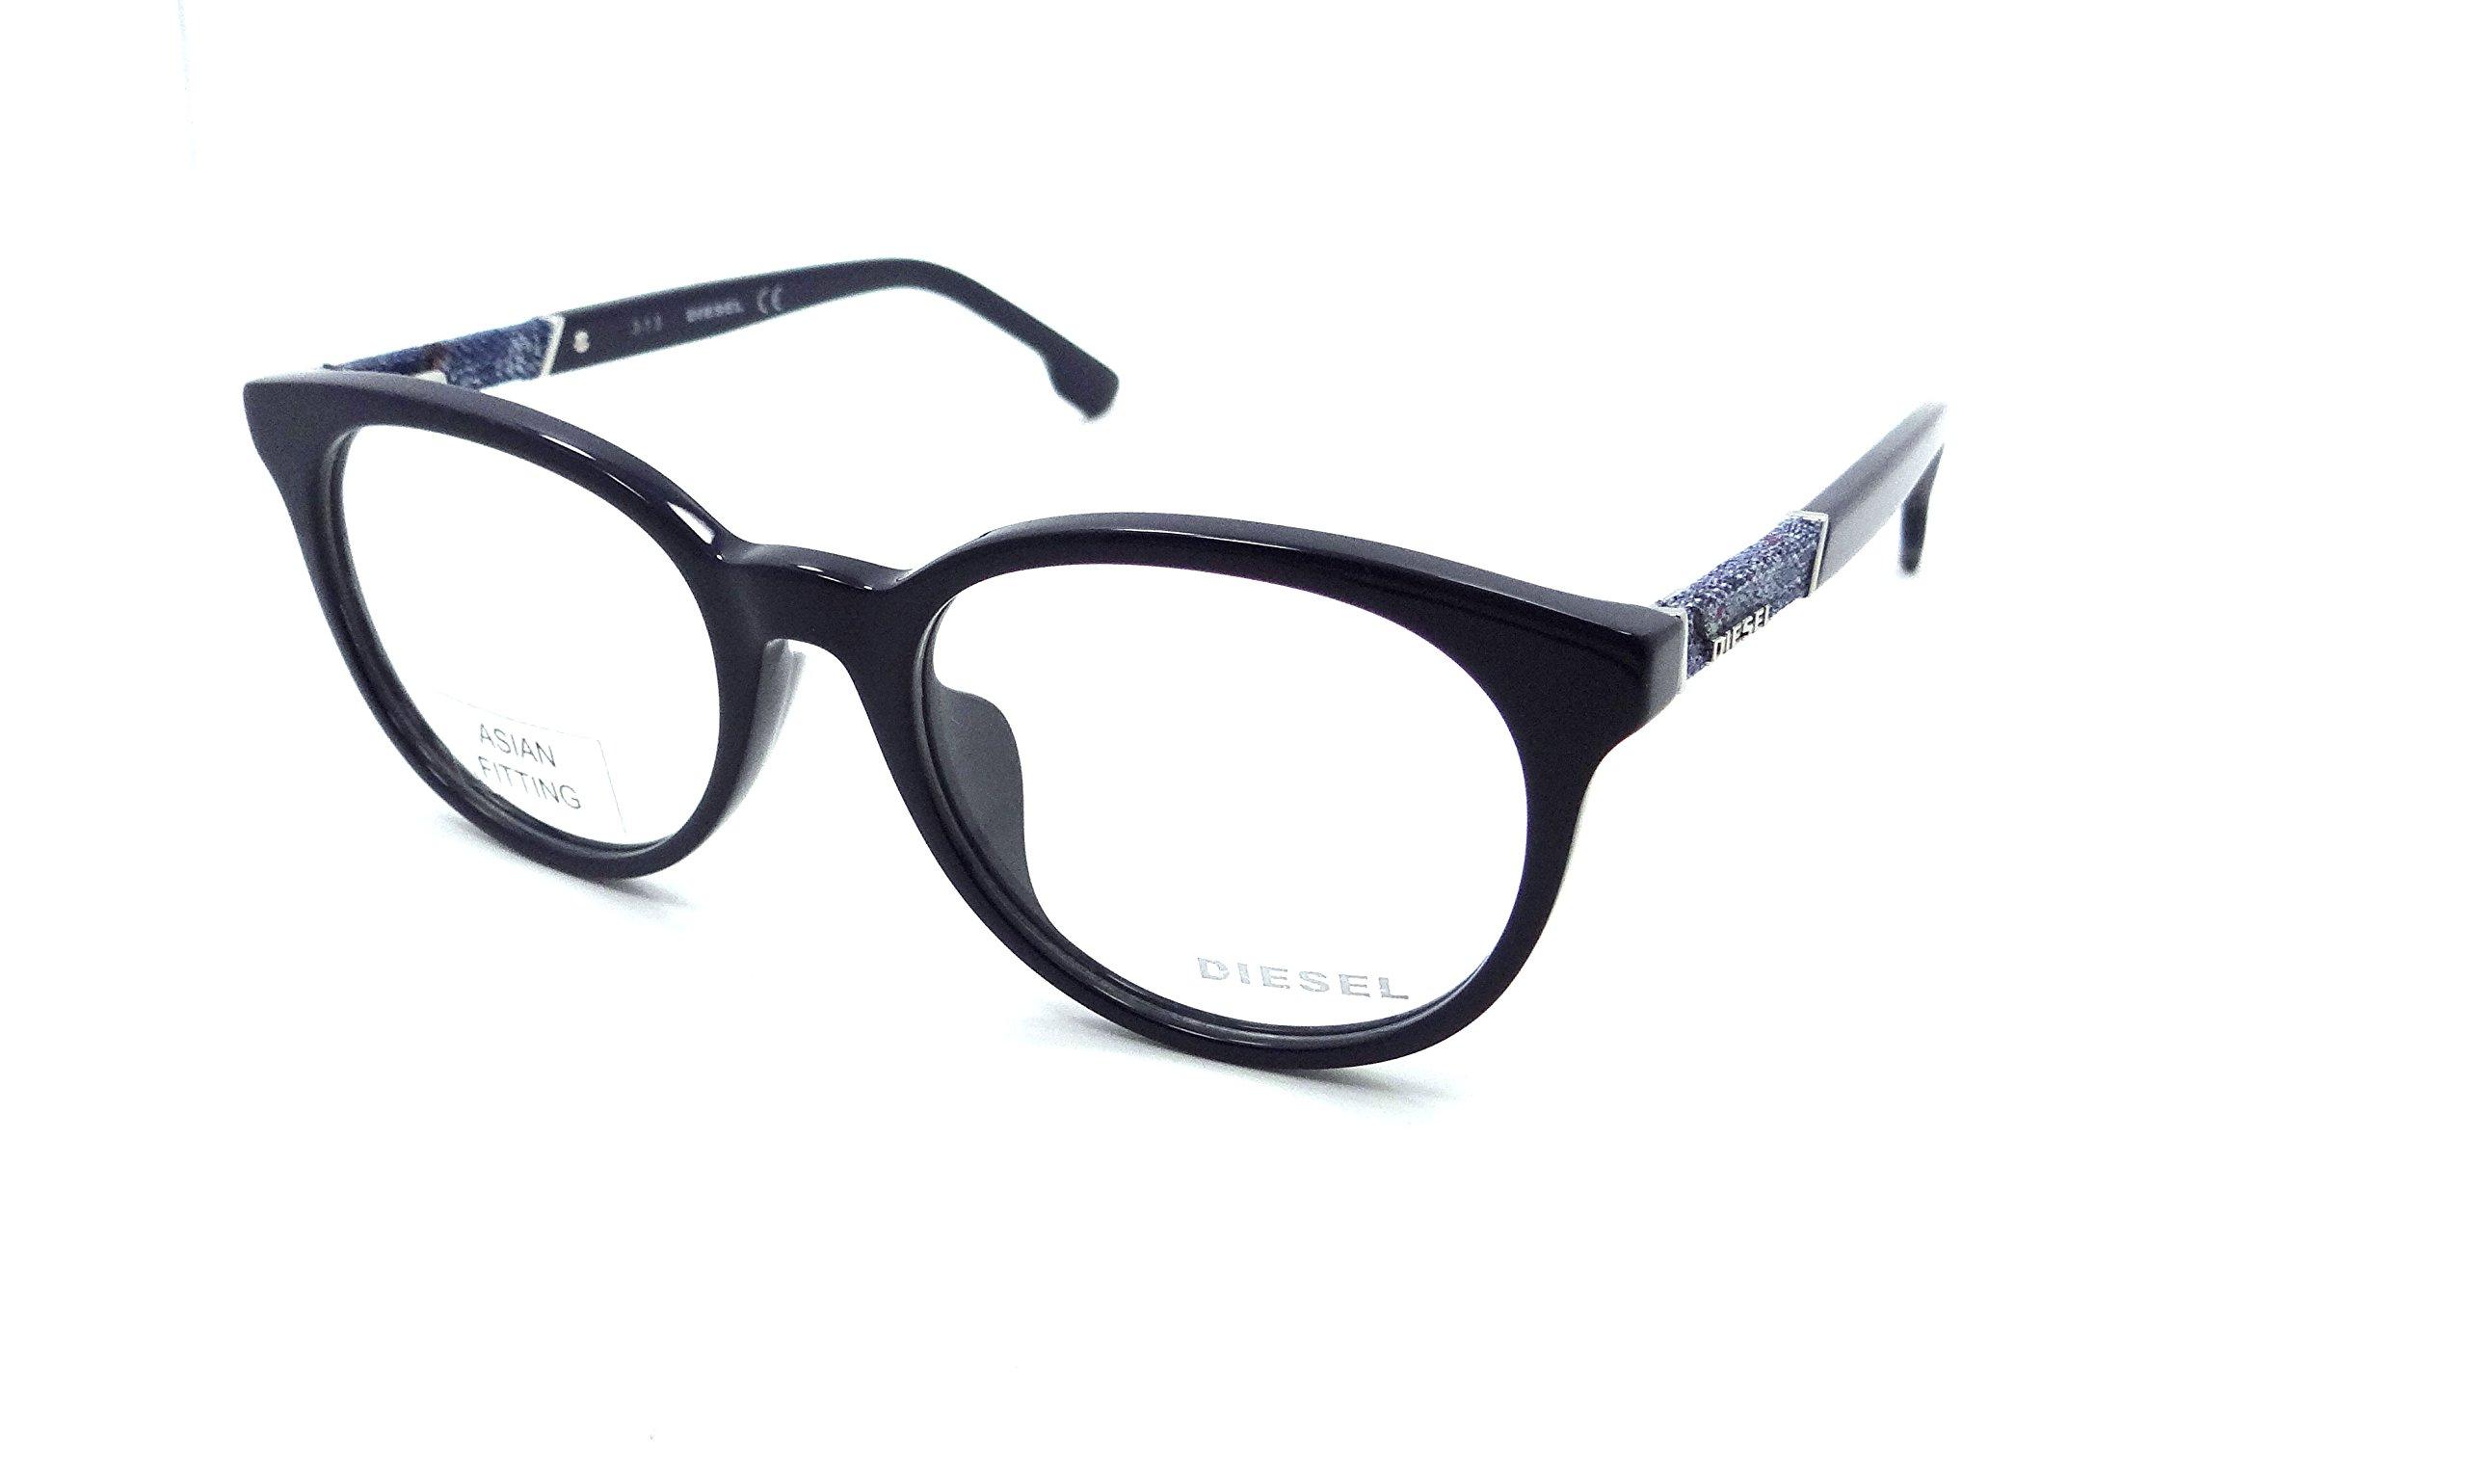 Diesel Rx Eyeglasses Frames DL5156-F 090 54-19-150 Dark Blue / Denim Asian Fit